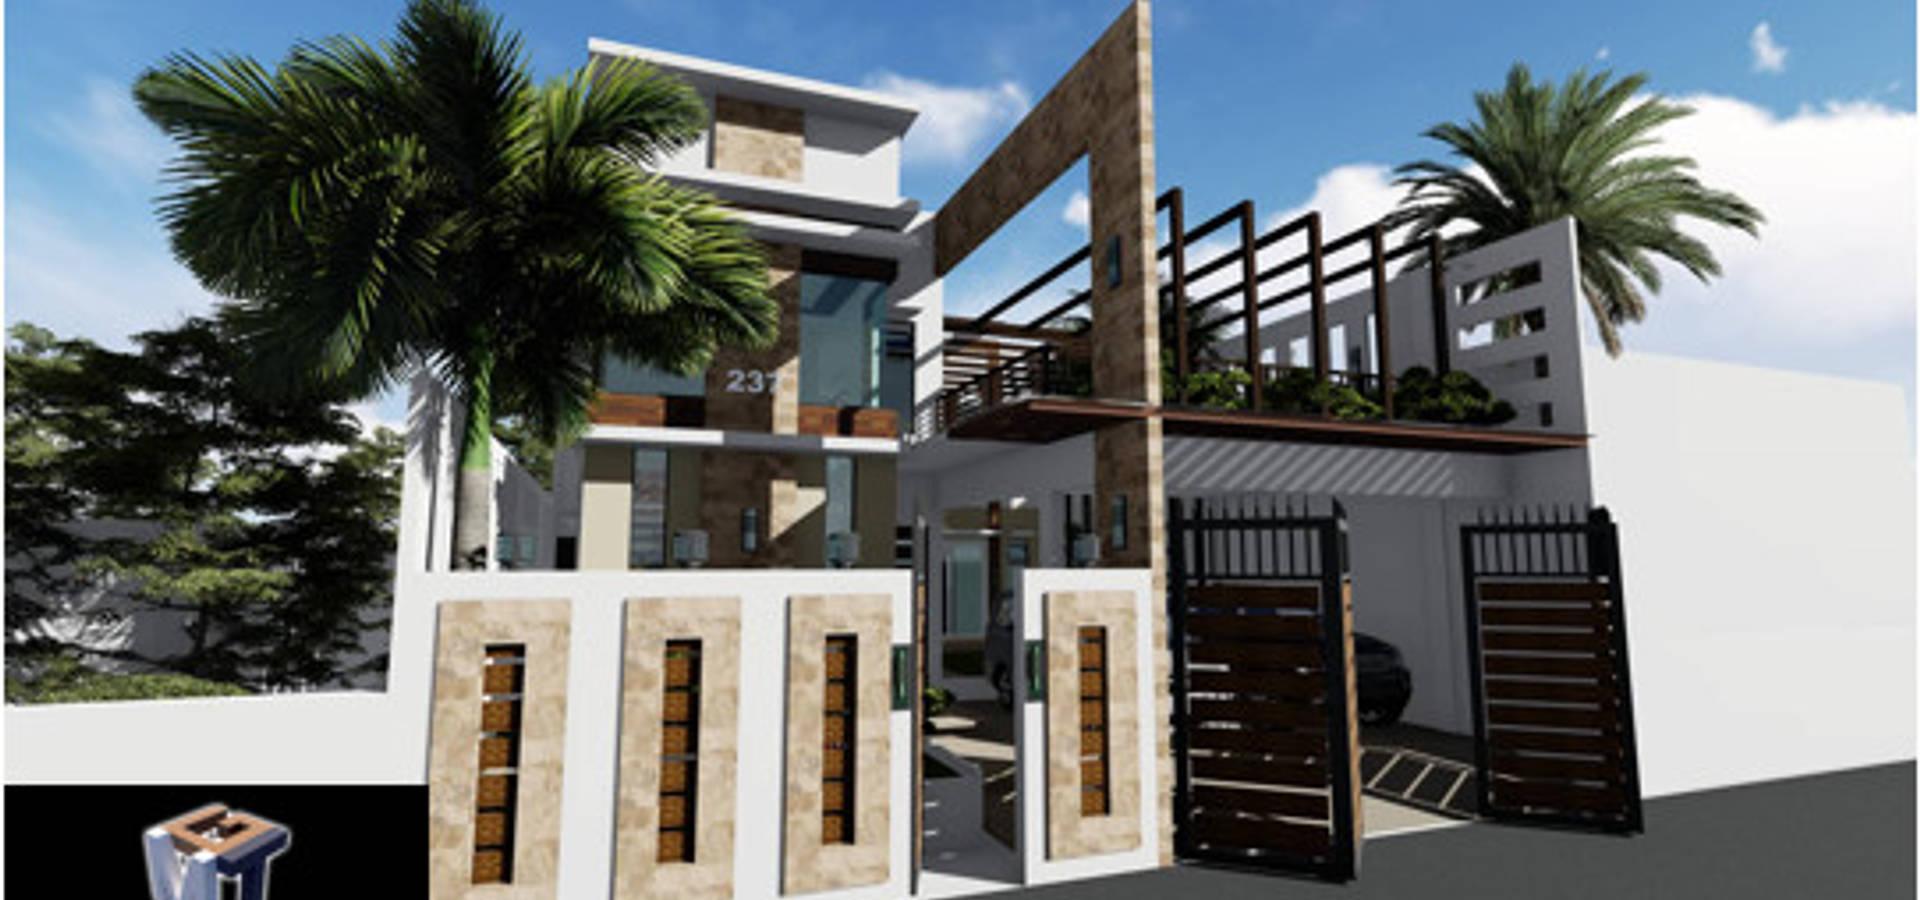 MGTua Architects + Design Innovations